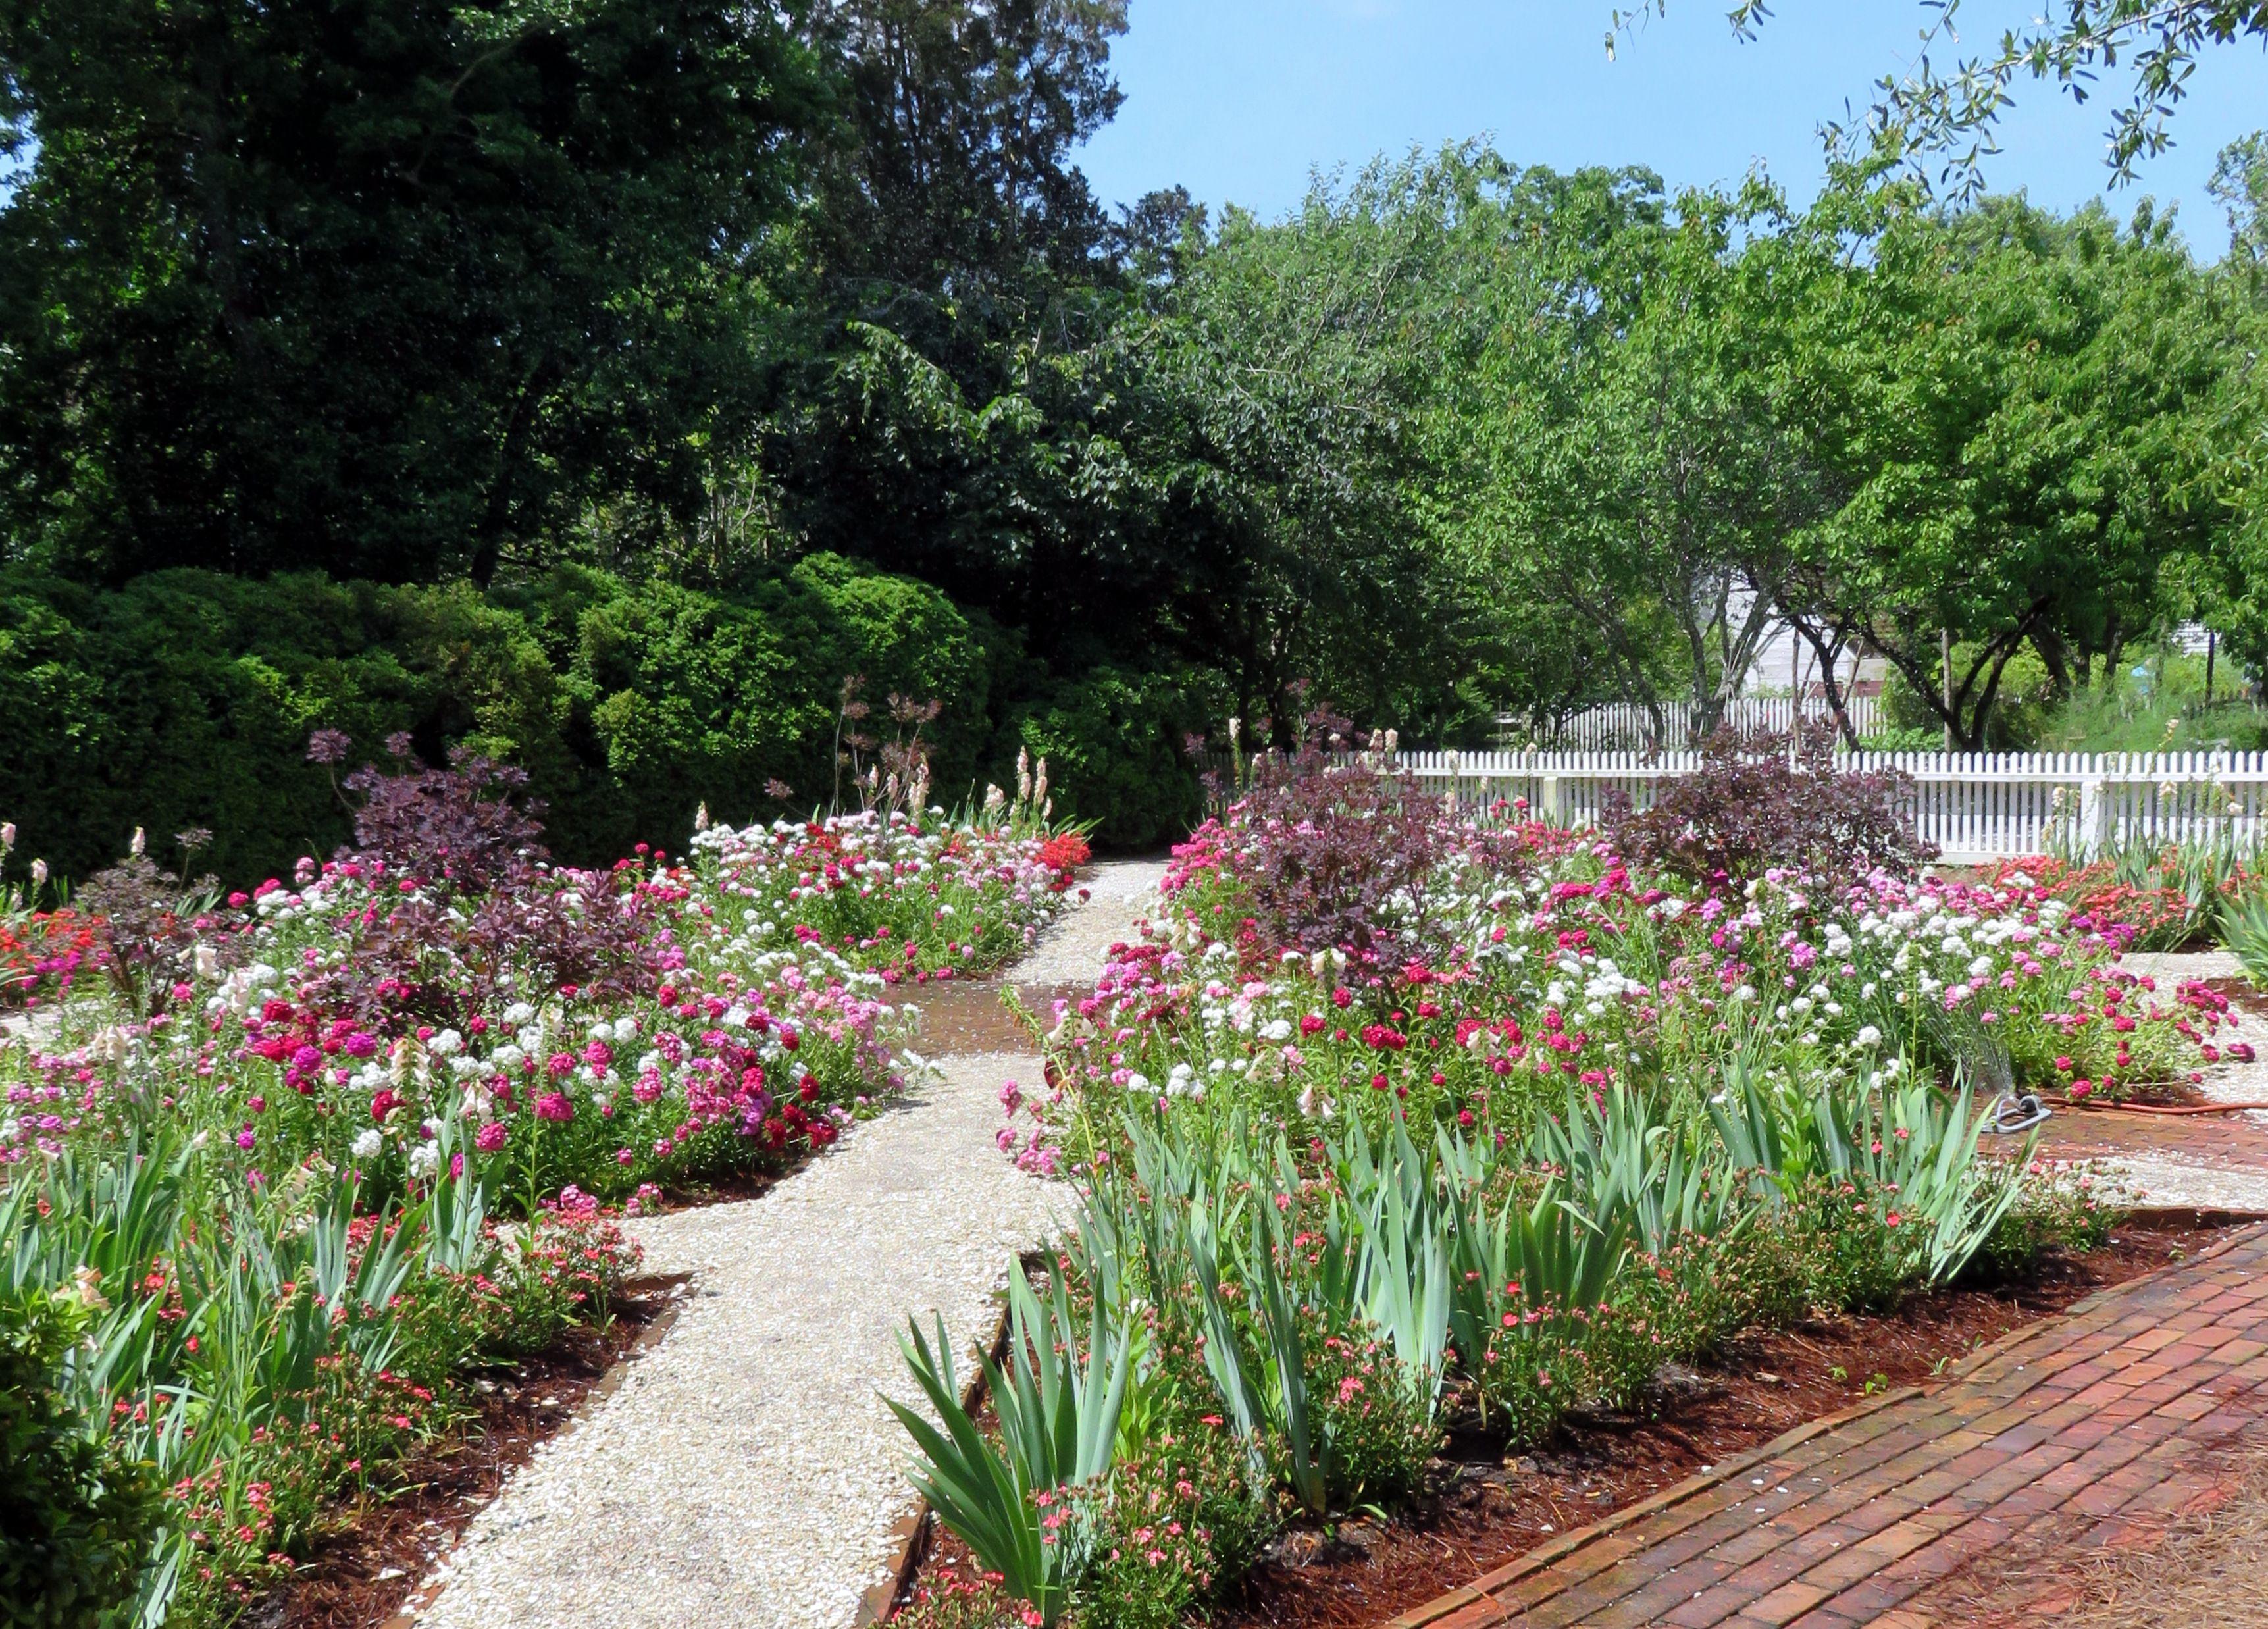 Colonial Williamsburg spring flowers | Colonial Williamsburg ...